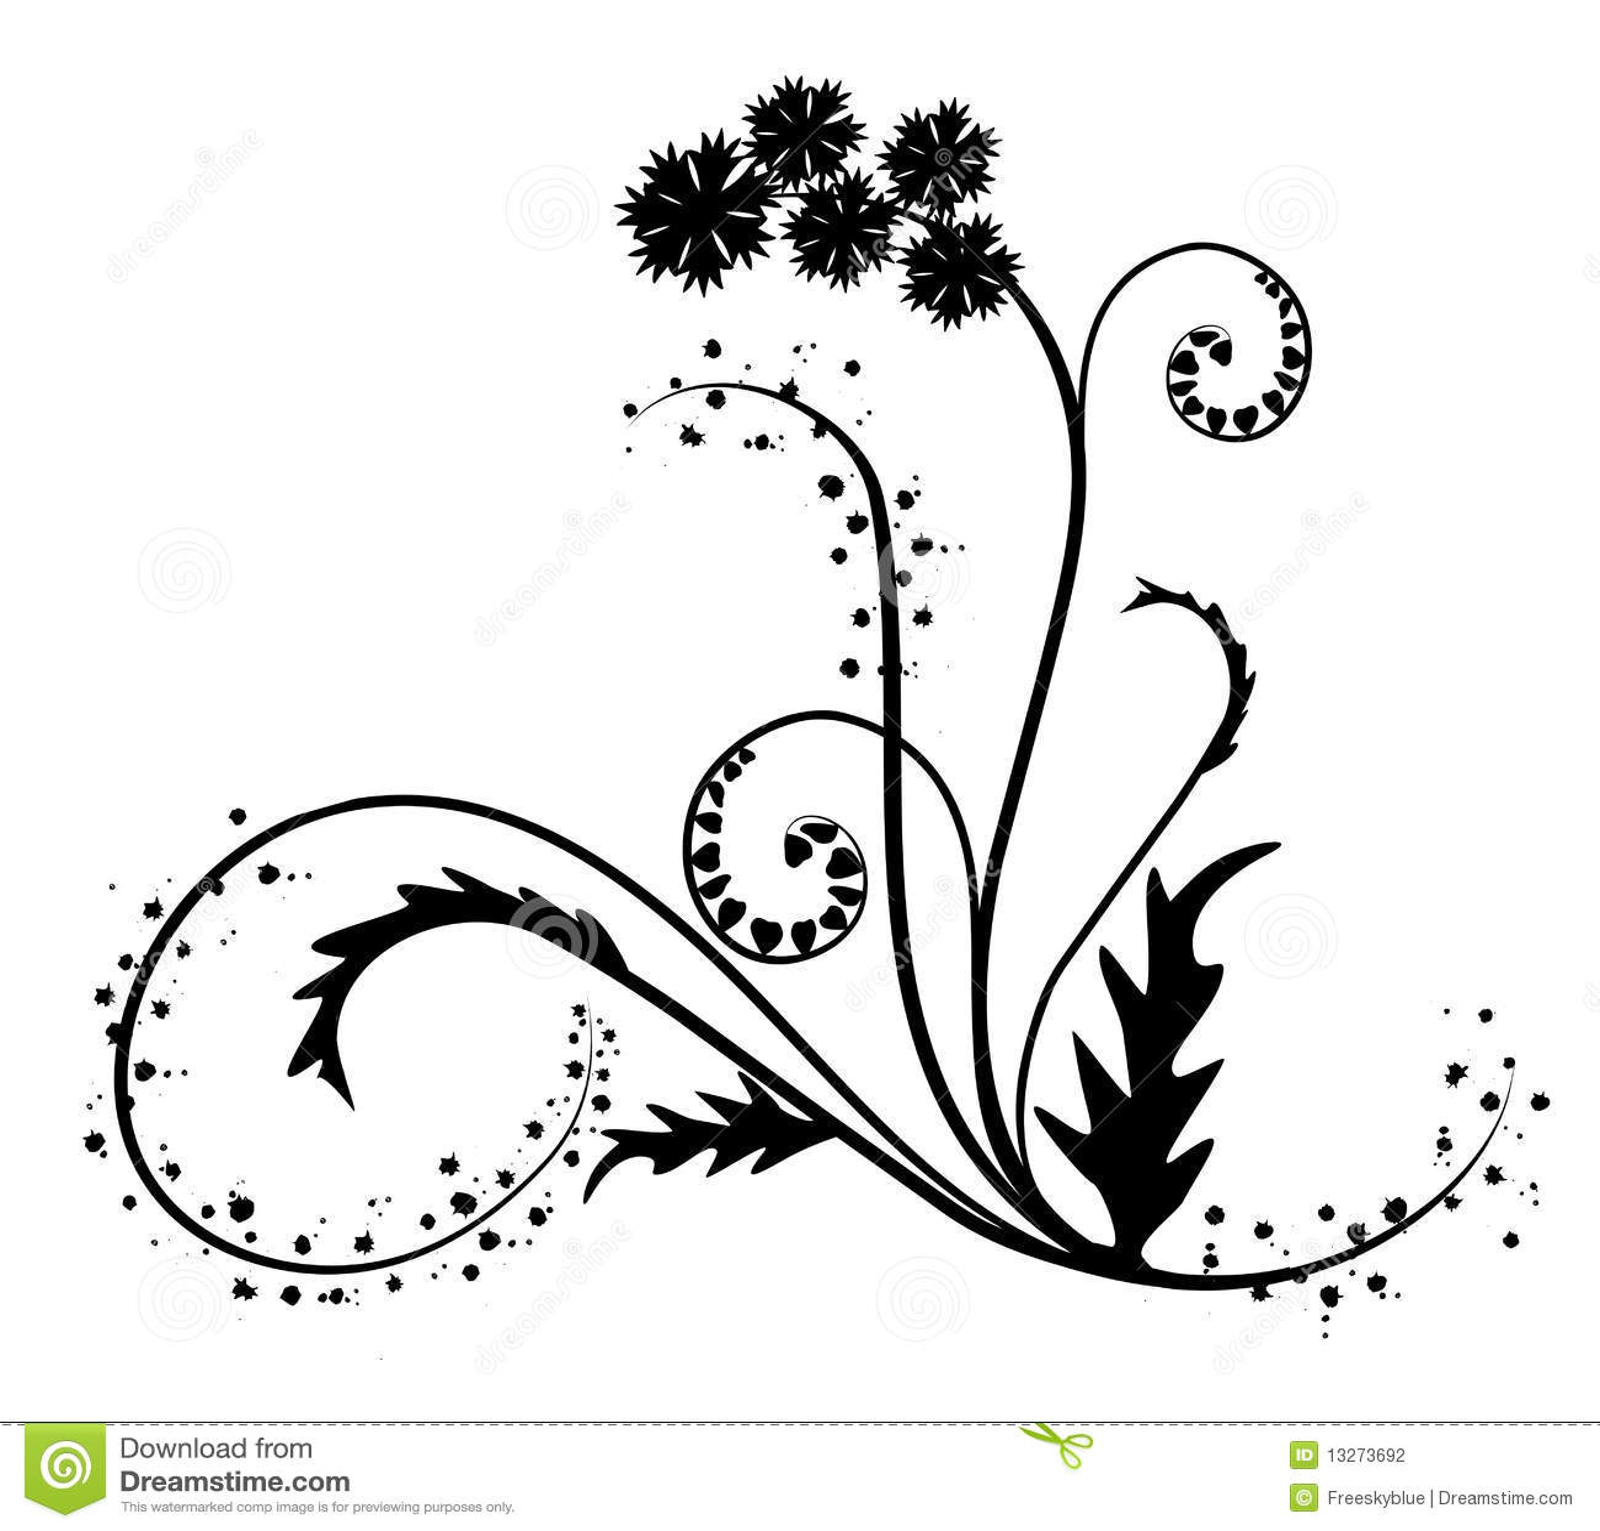 Black Flower Silhouette Pattern Royalty Free Stock Images: Silhouette Of Black Flower Pattern Stock Illustration